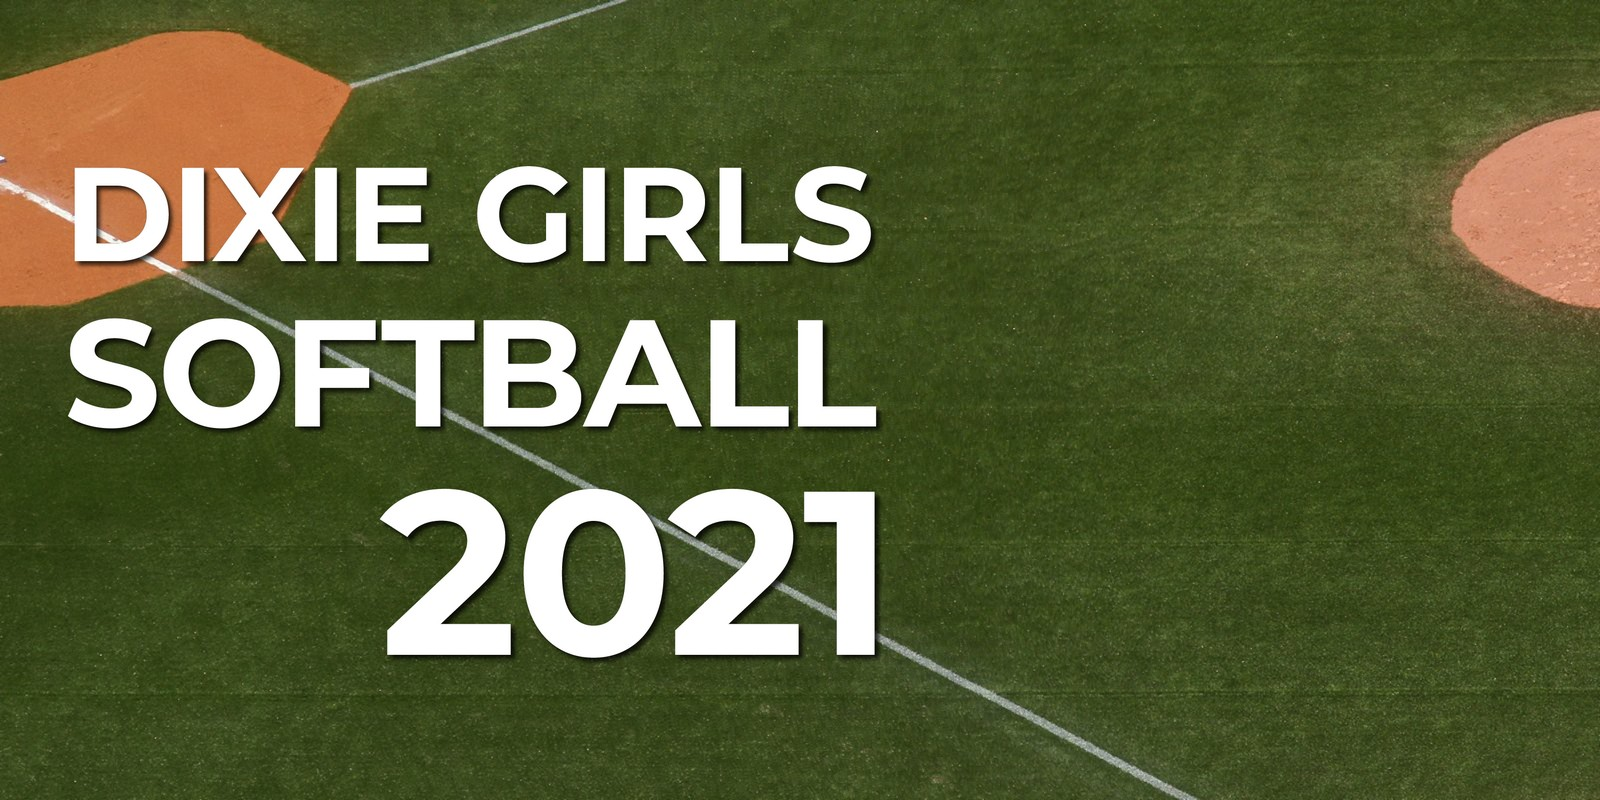 Dixie Girls Softball 2021